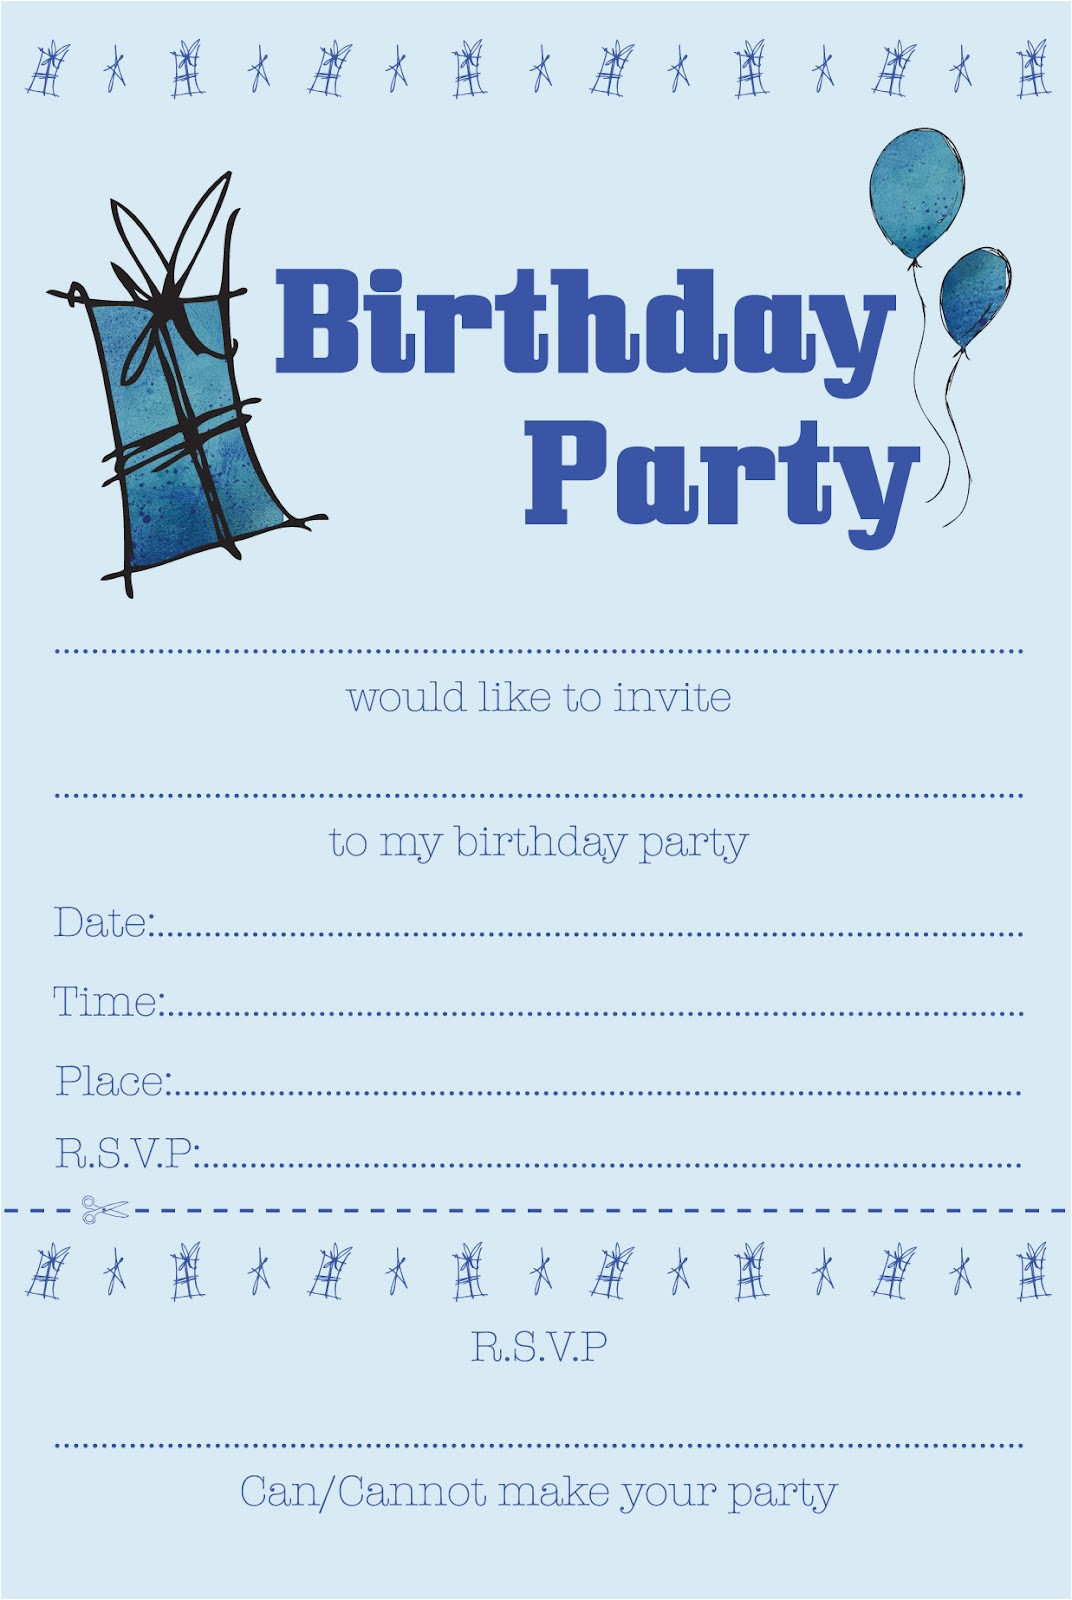 childrens party invites